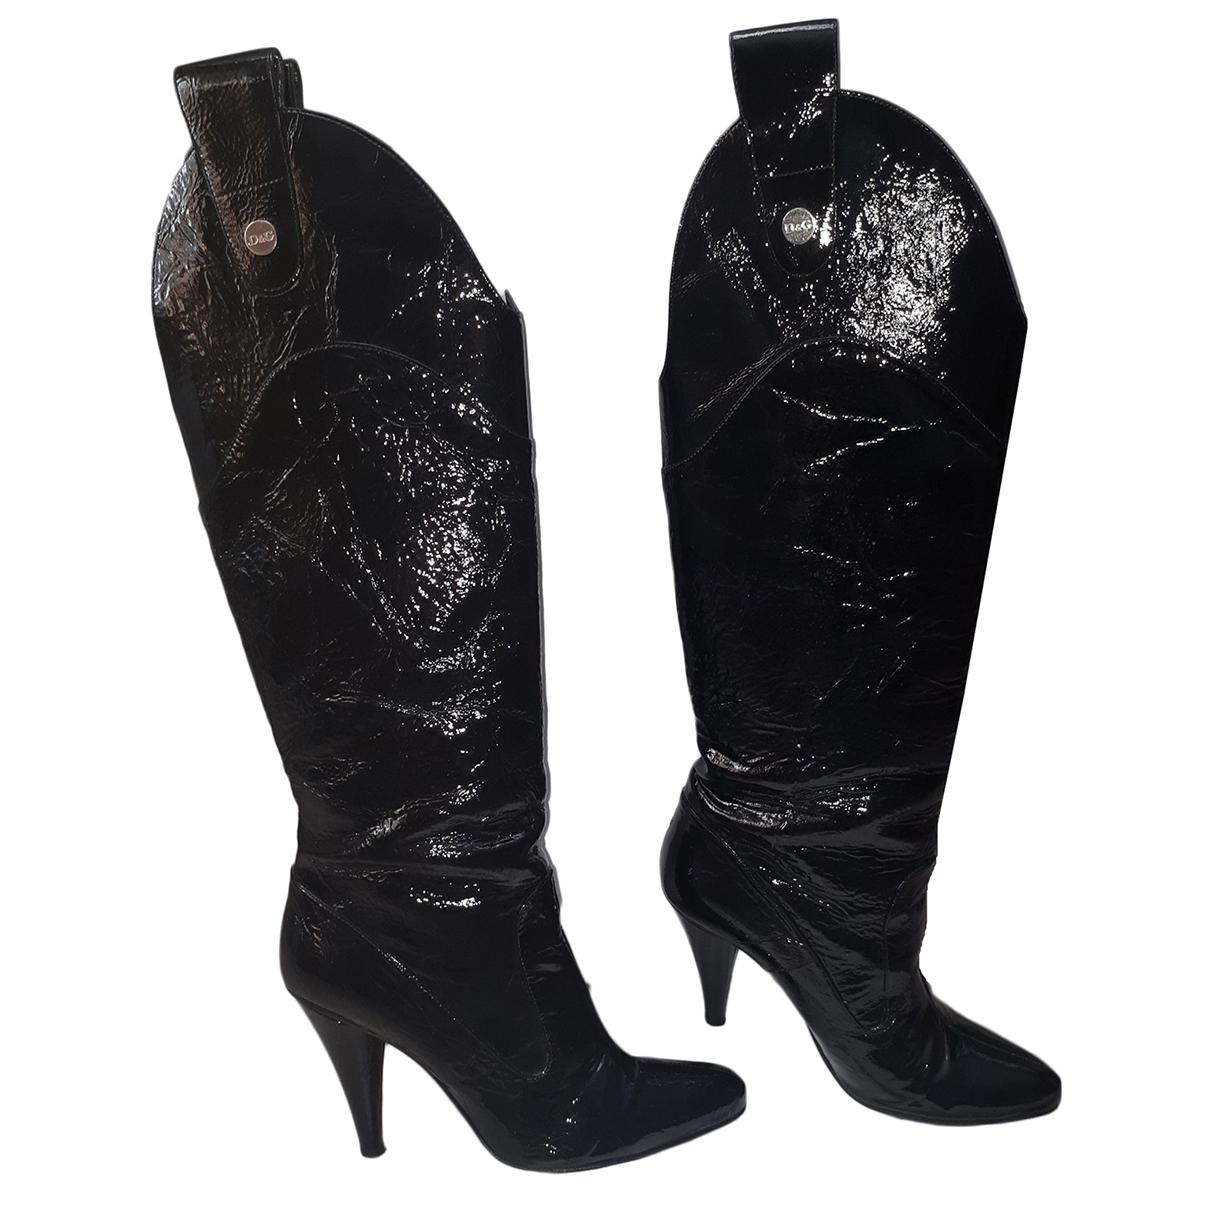 D&g \N Stiefel in  Schwarz Lackleder